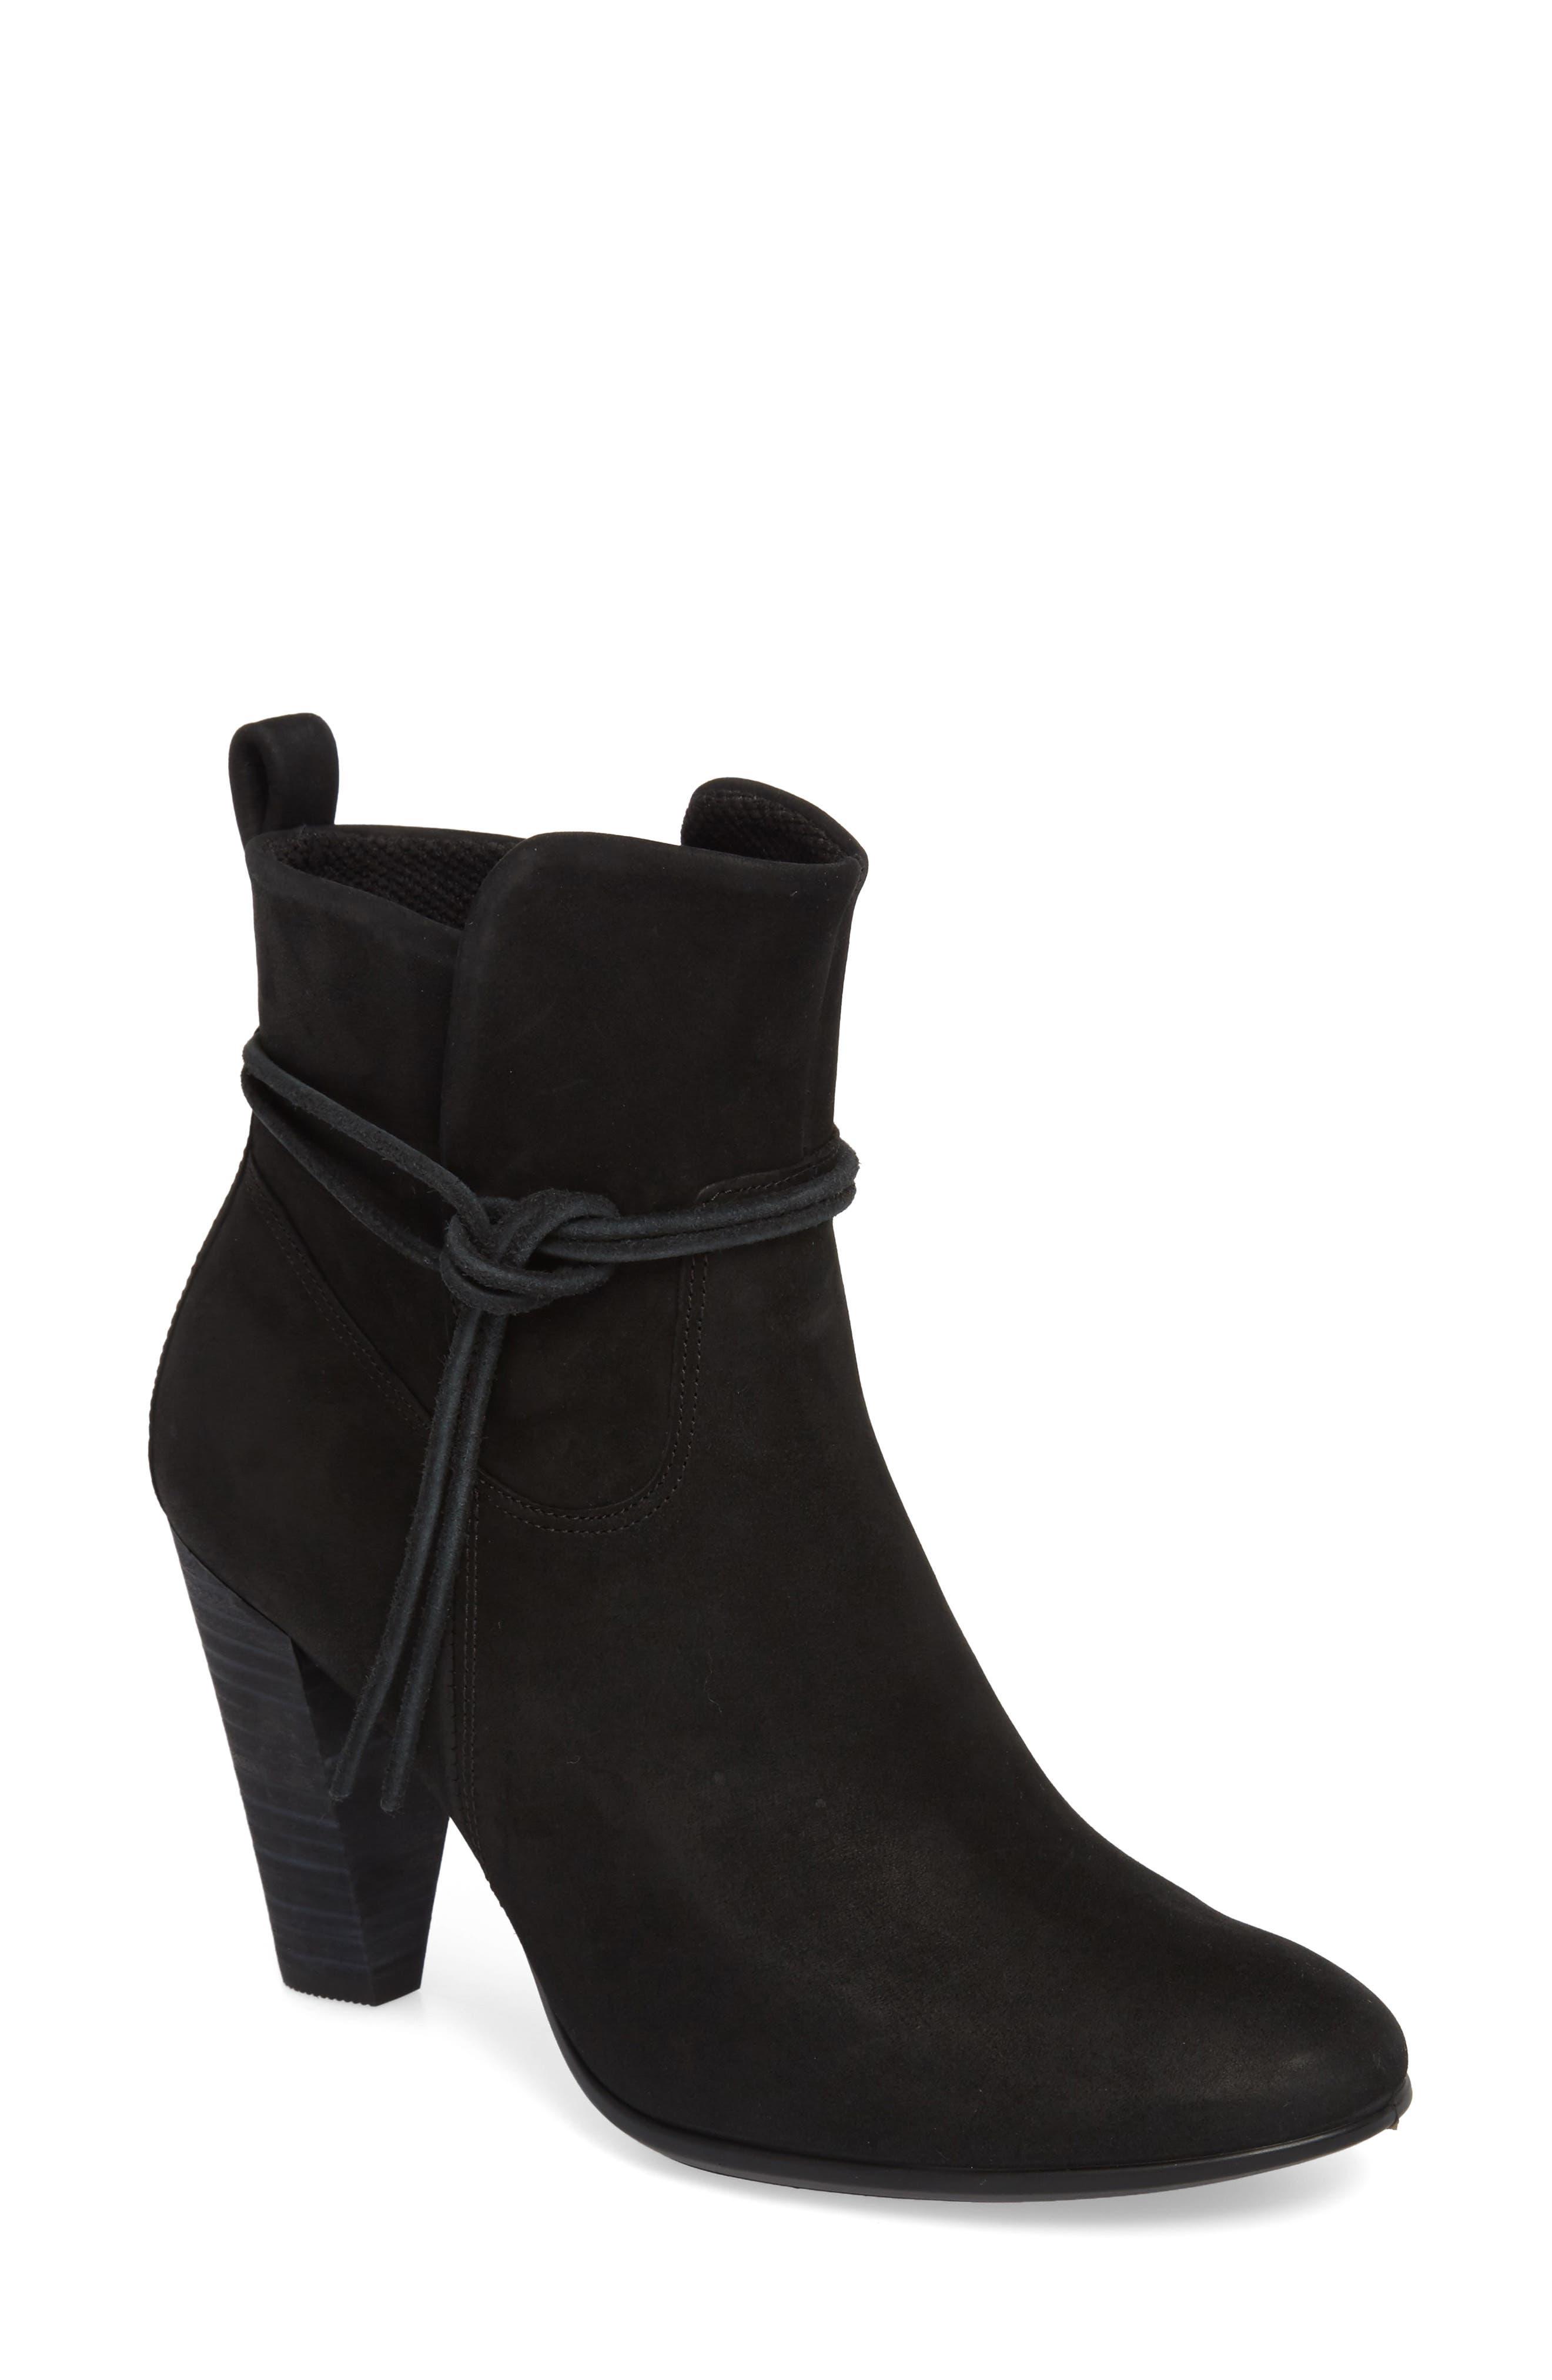 Main Image - ECCO Shape 75 Tassel Boot (Women)